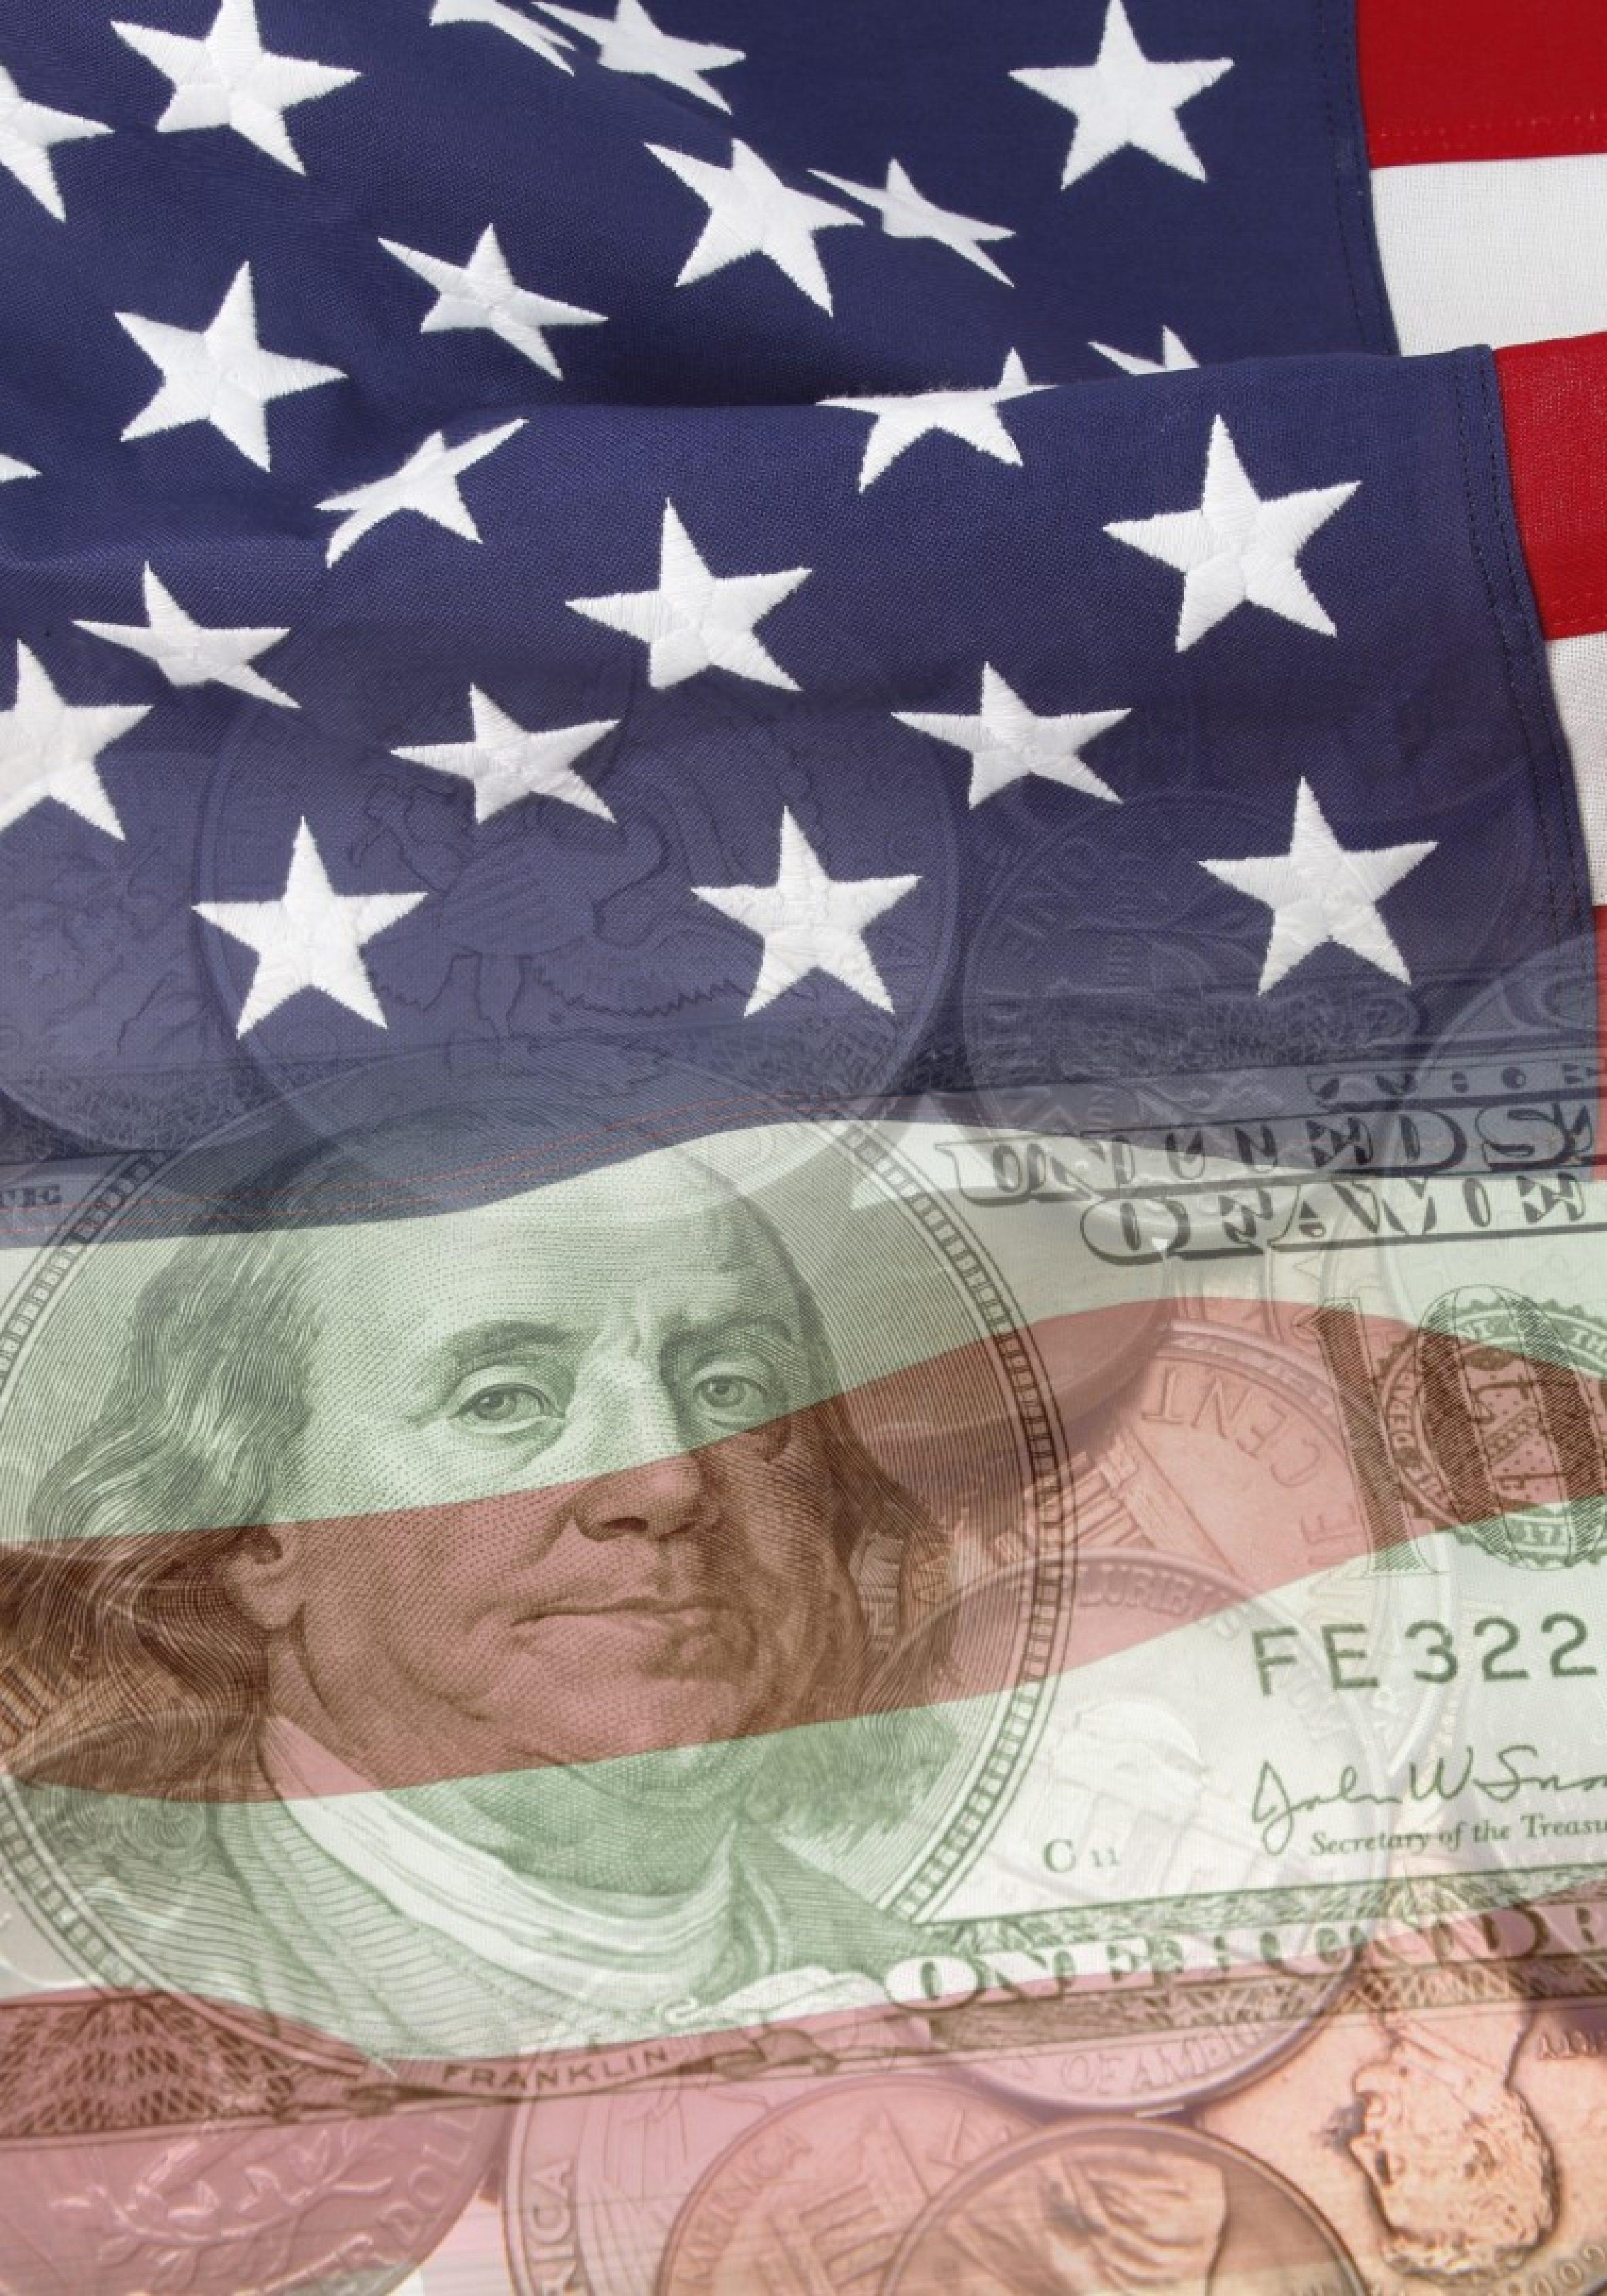 America-money-Large-3500x5000.jpg